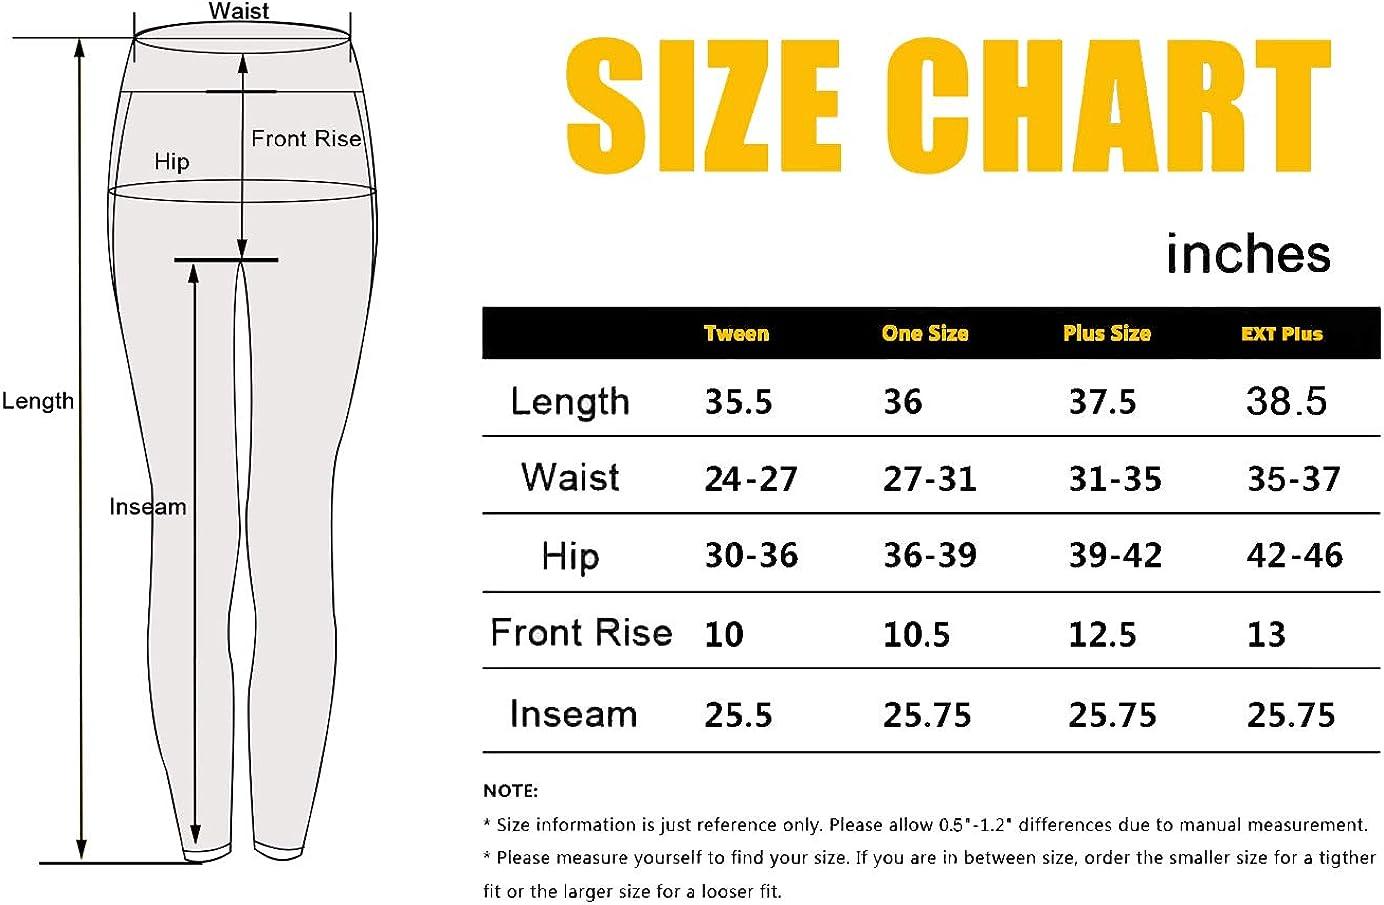 QYQ Buttery Soft Women's Leggings -10+Colors -High Waisted Yoga Pants w Hidden Inner Pocket, Reg&Plus Size : Sports & Outdoors